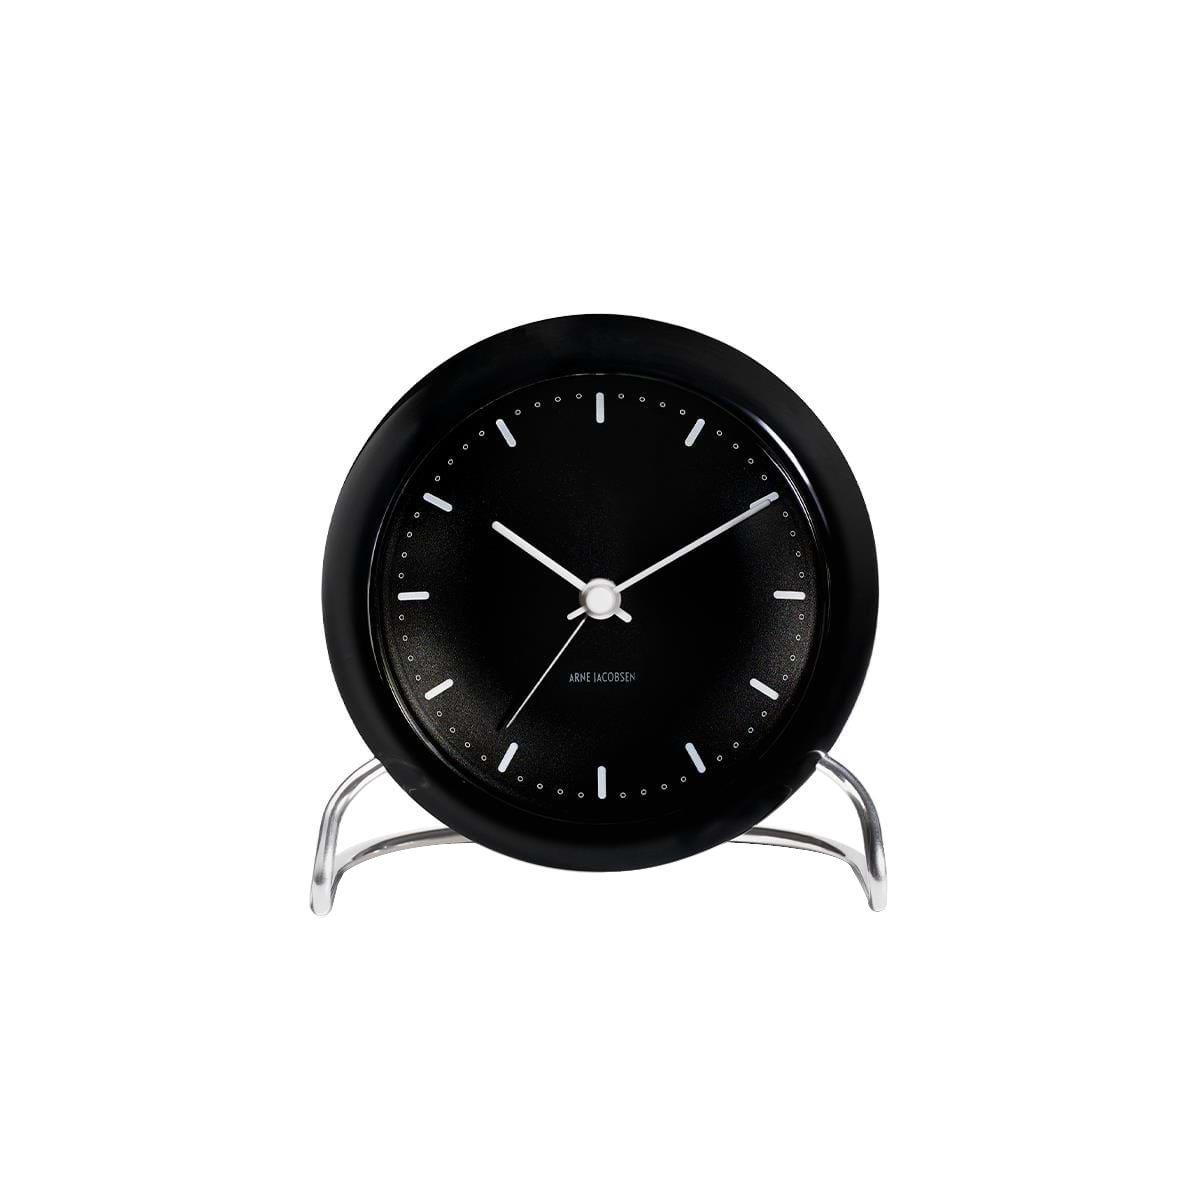 Arne Jacobsen - City Hall Table Clock - Black (43673)